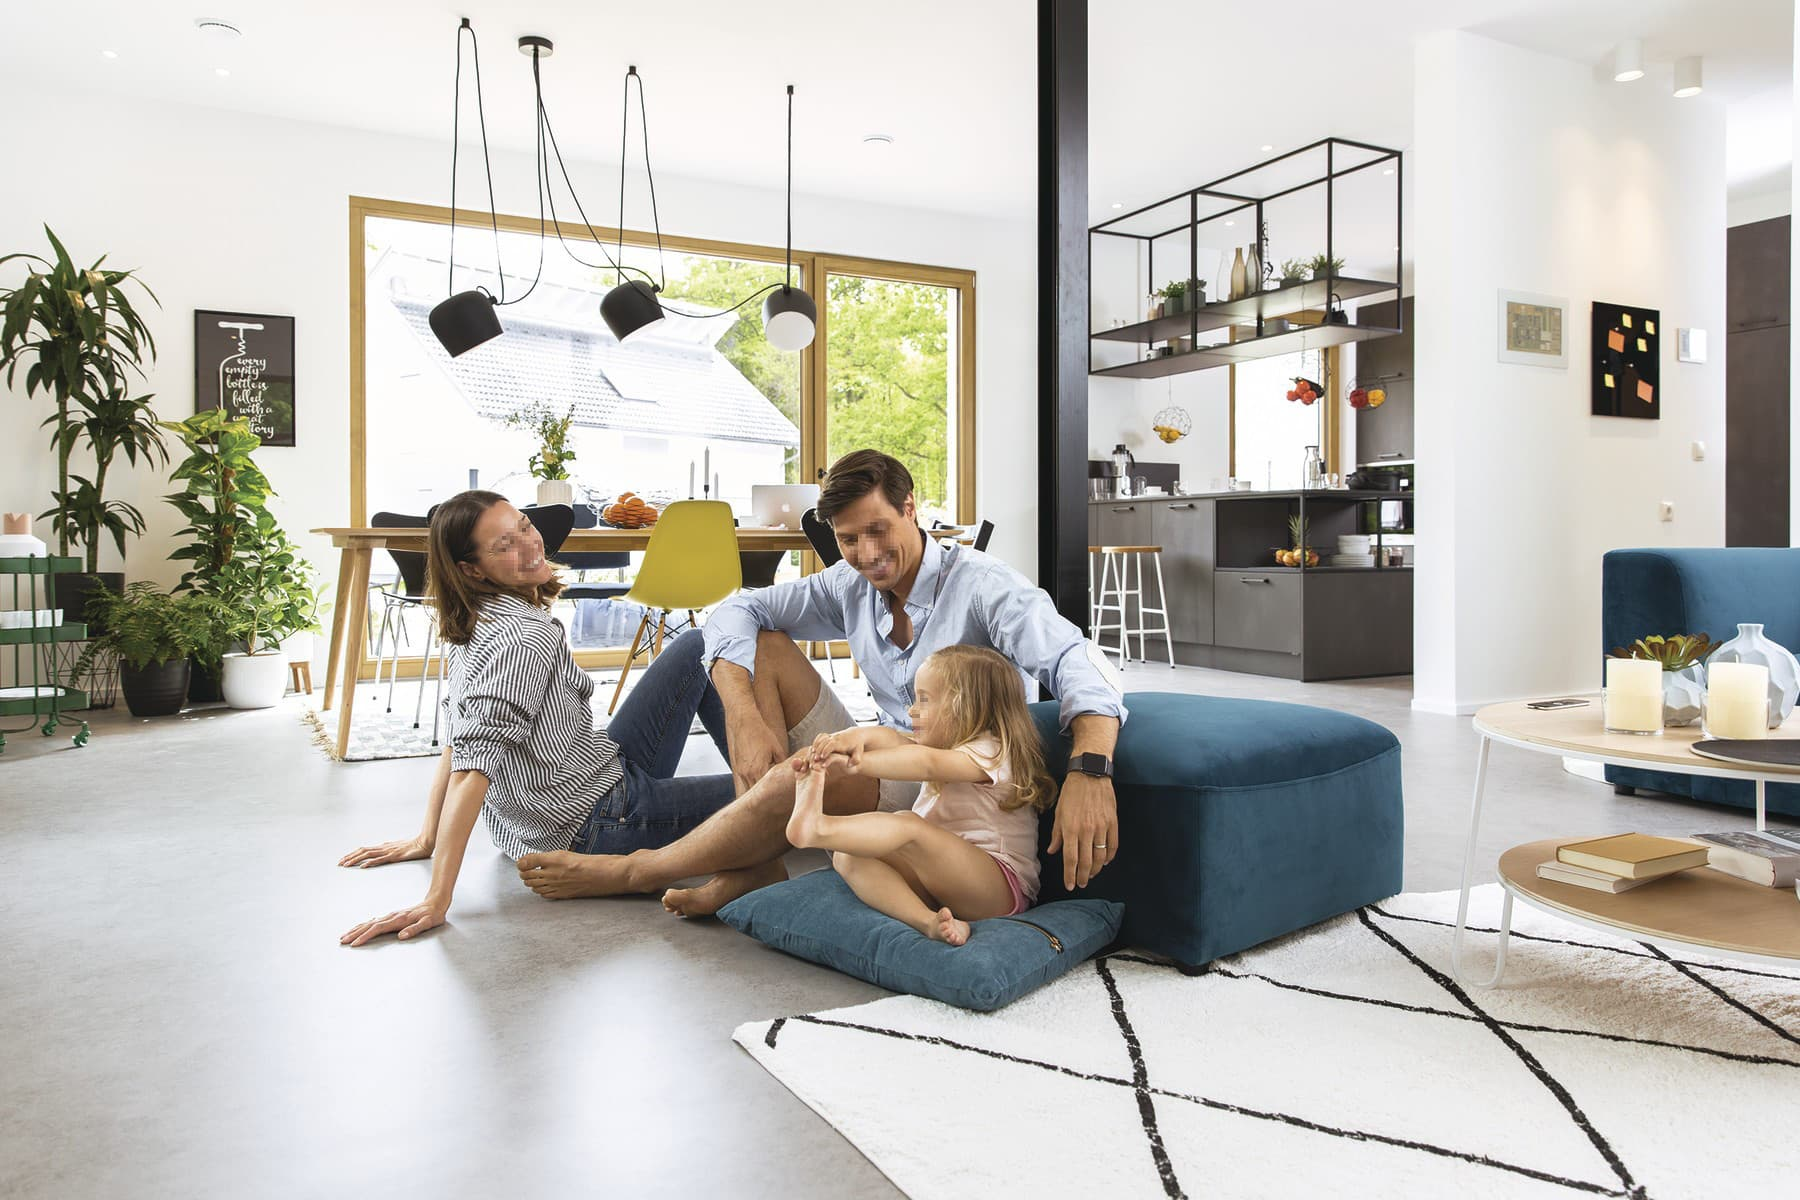 Wohn-Esszimmer modern offen mit Küche - Inneneinrichtung Haus Design Ideen - Fertighaus Sunshine 220 WeberHaus - HausbauDirekt.de